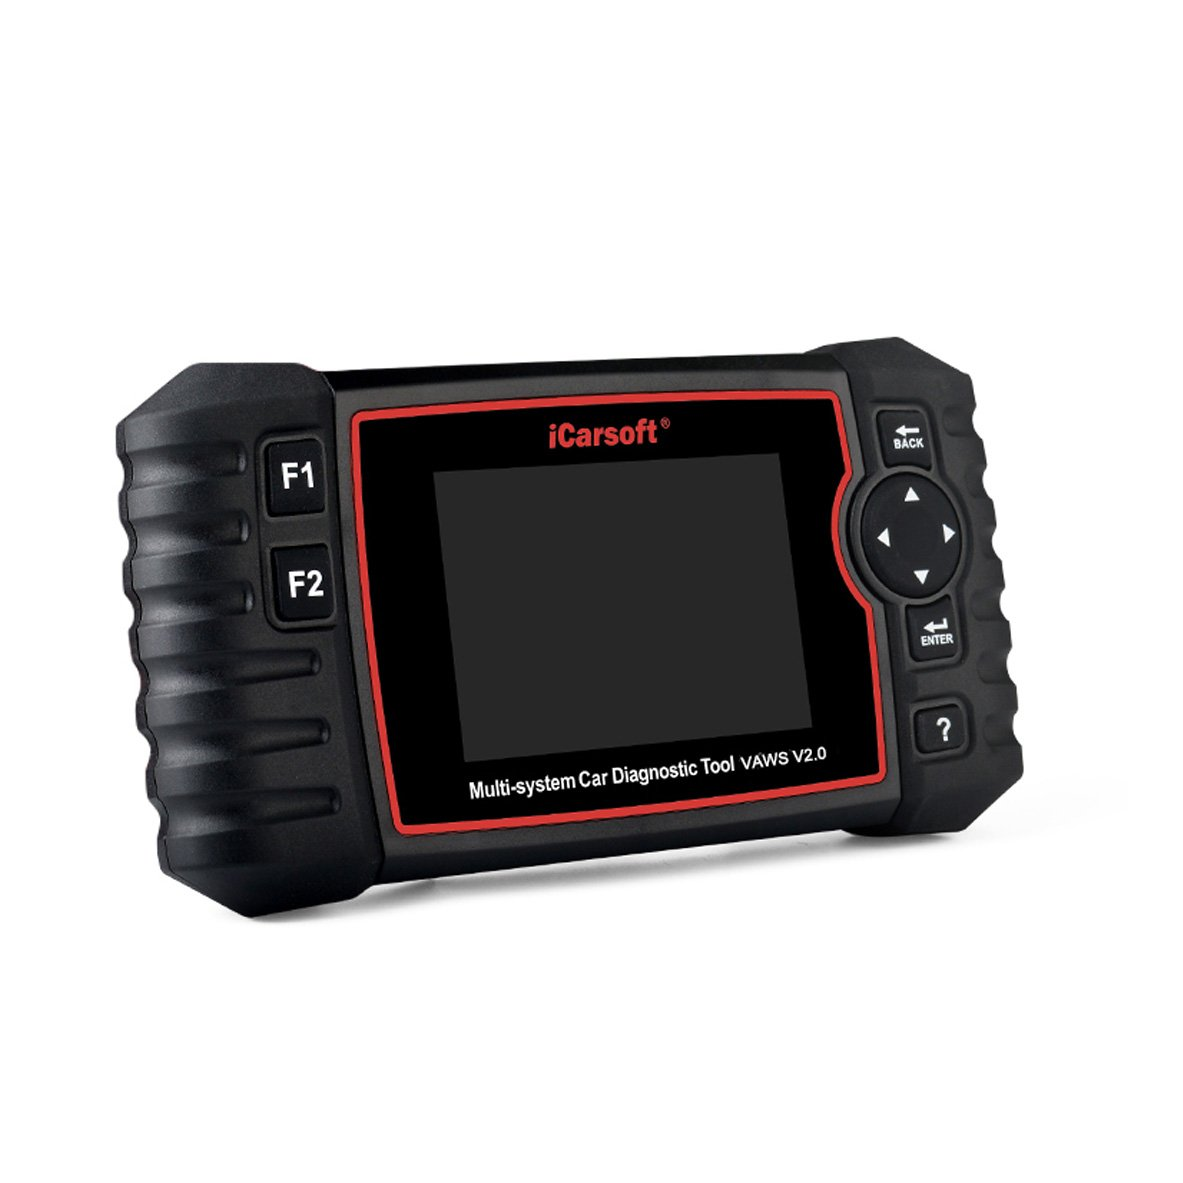 iCarsoft Professional Multi-System Auto Diagnostic Tool VAWS V2.0 for Audi/VW/Seat/Skoda, Oil Reset, DPF Reset, BMS Reset INJ